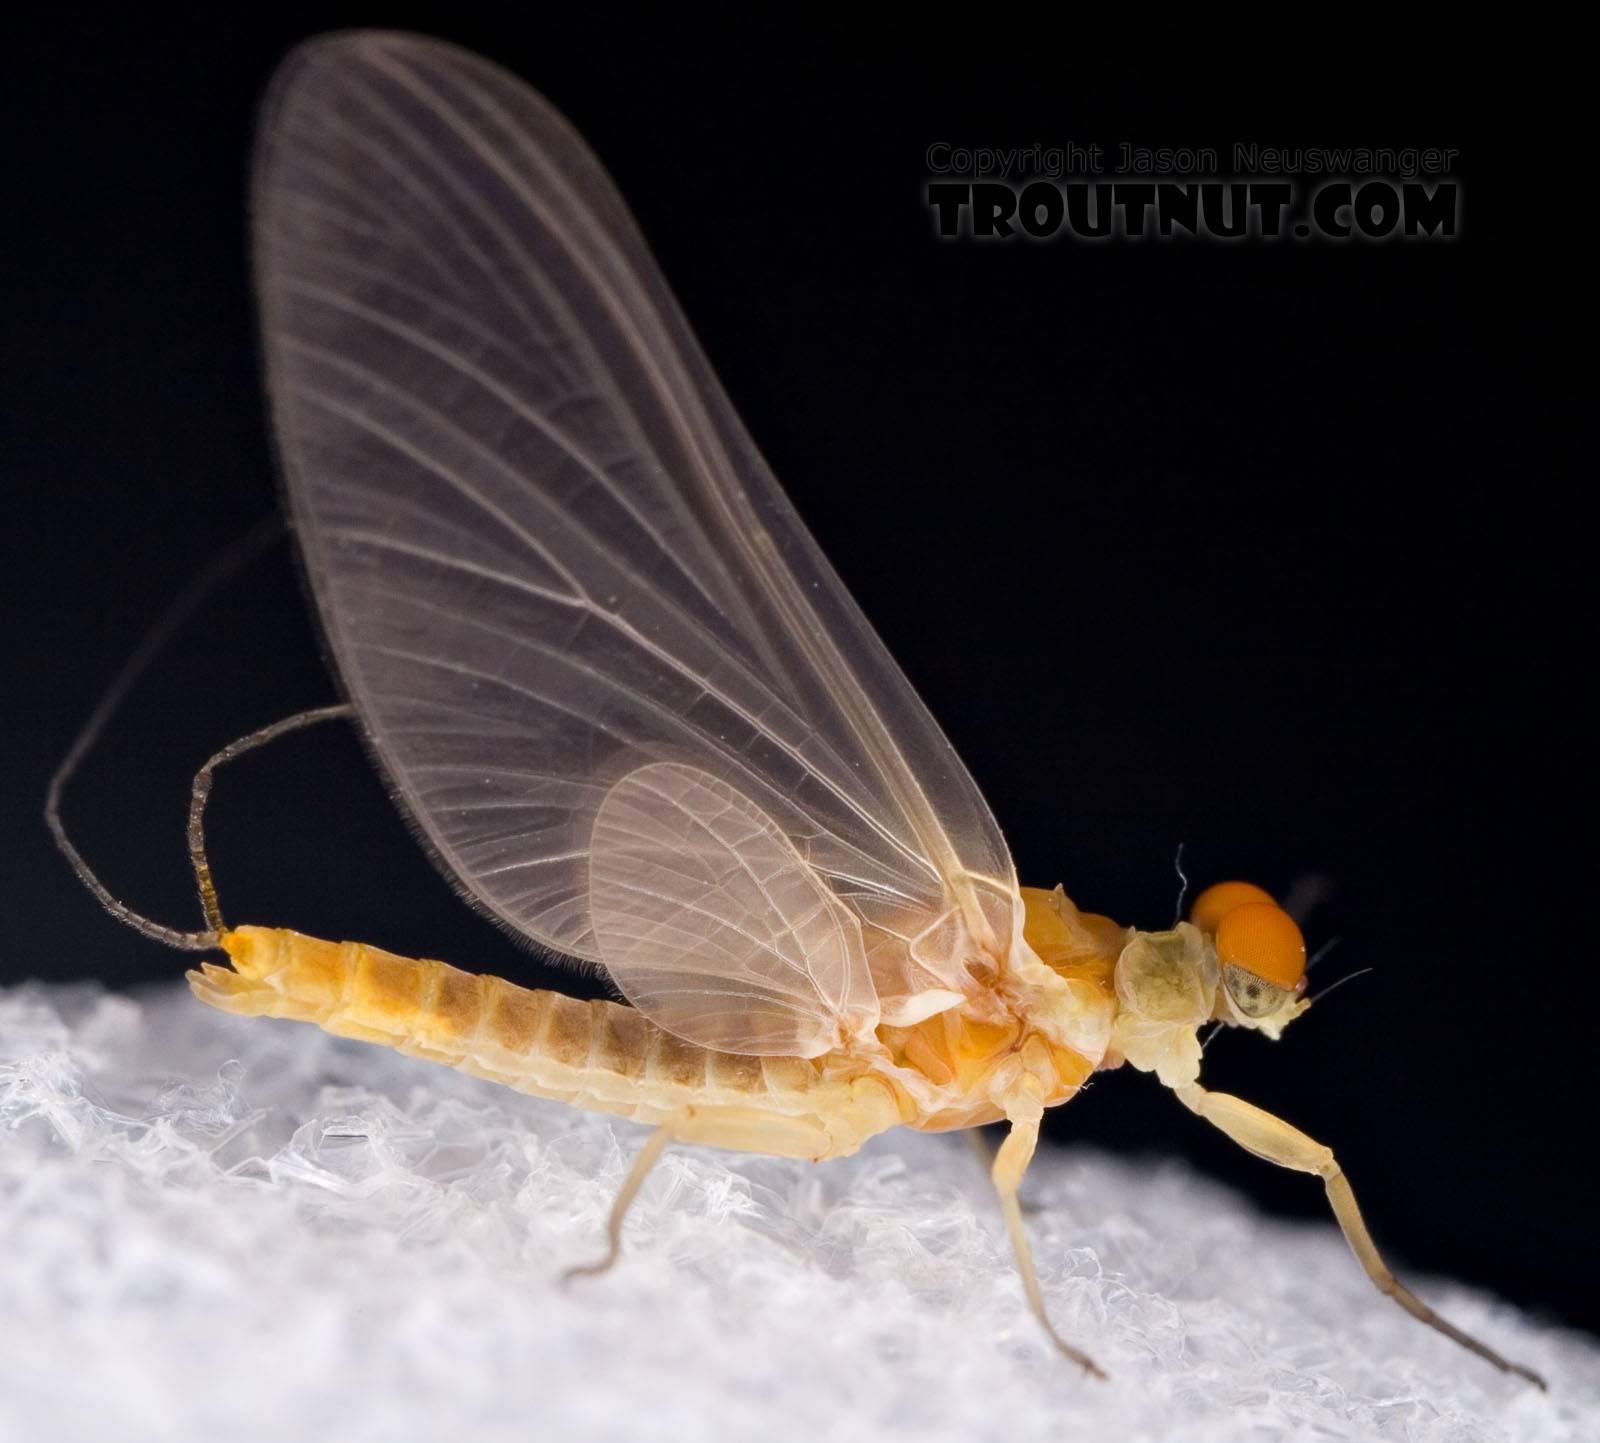 Male Ephemerella invaria (Sulphur Dun) Mayfly Dun from the Little Juniata River in Pennsylvania